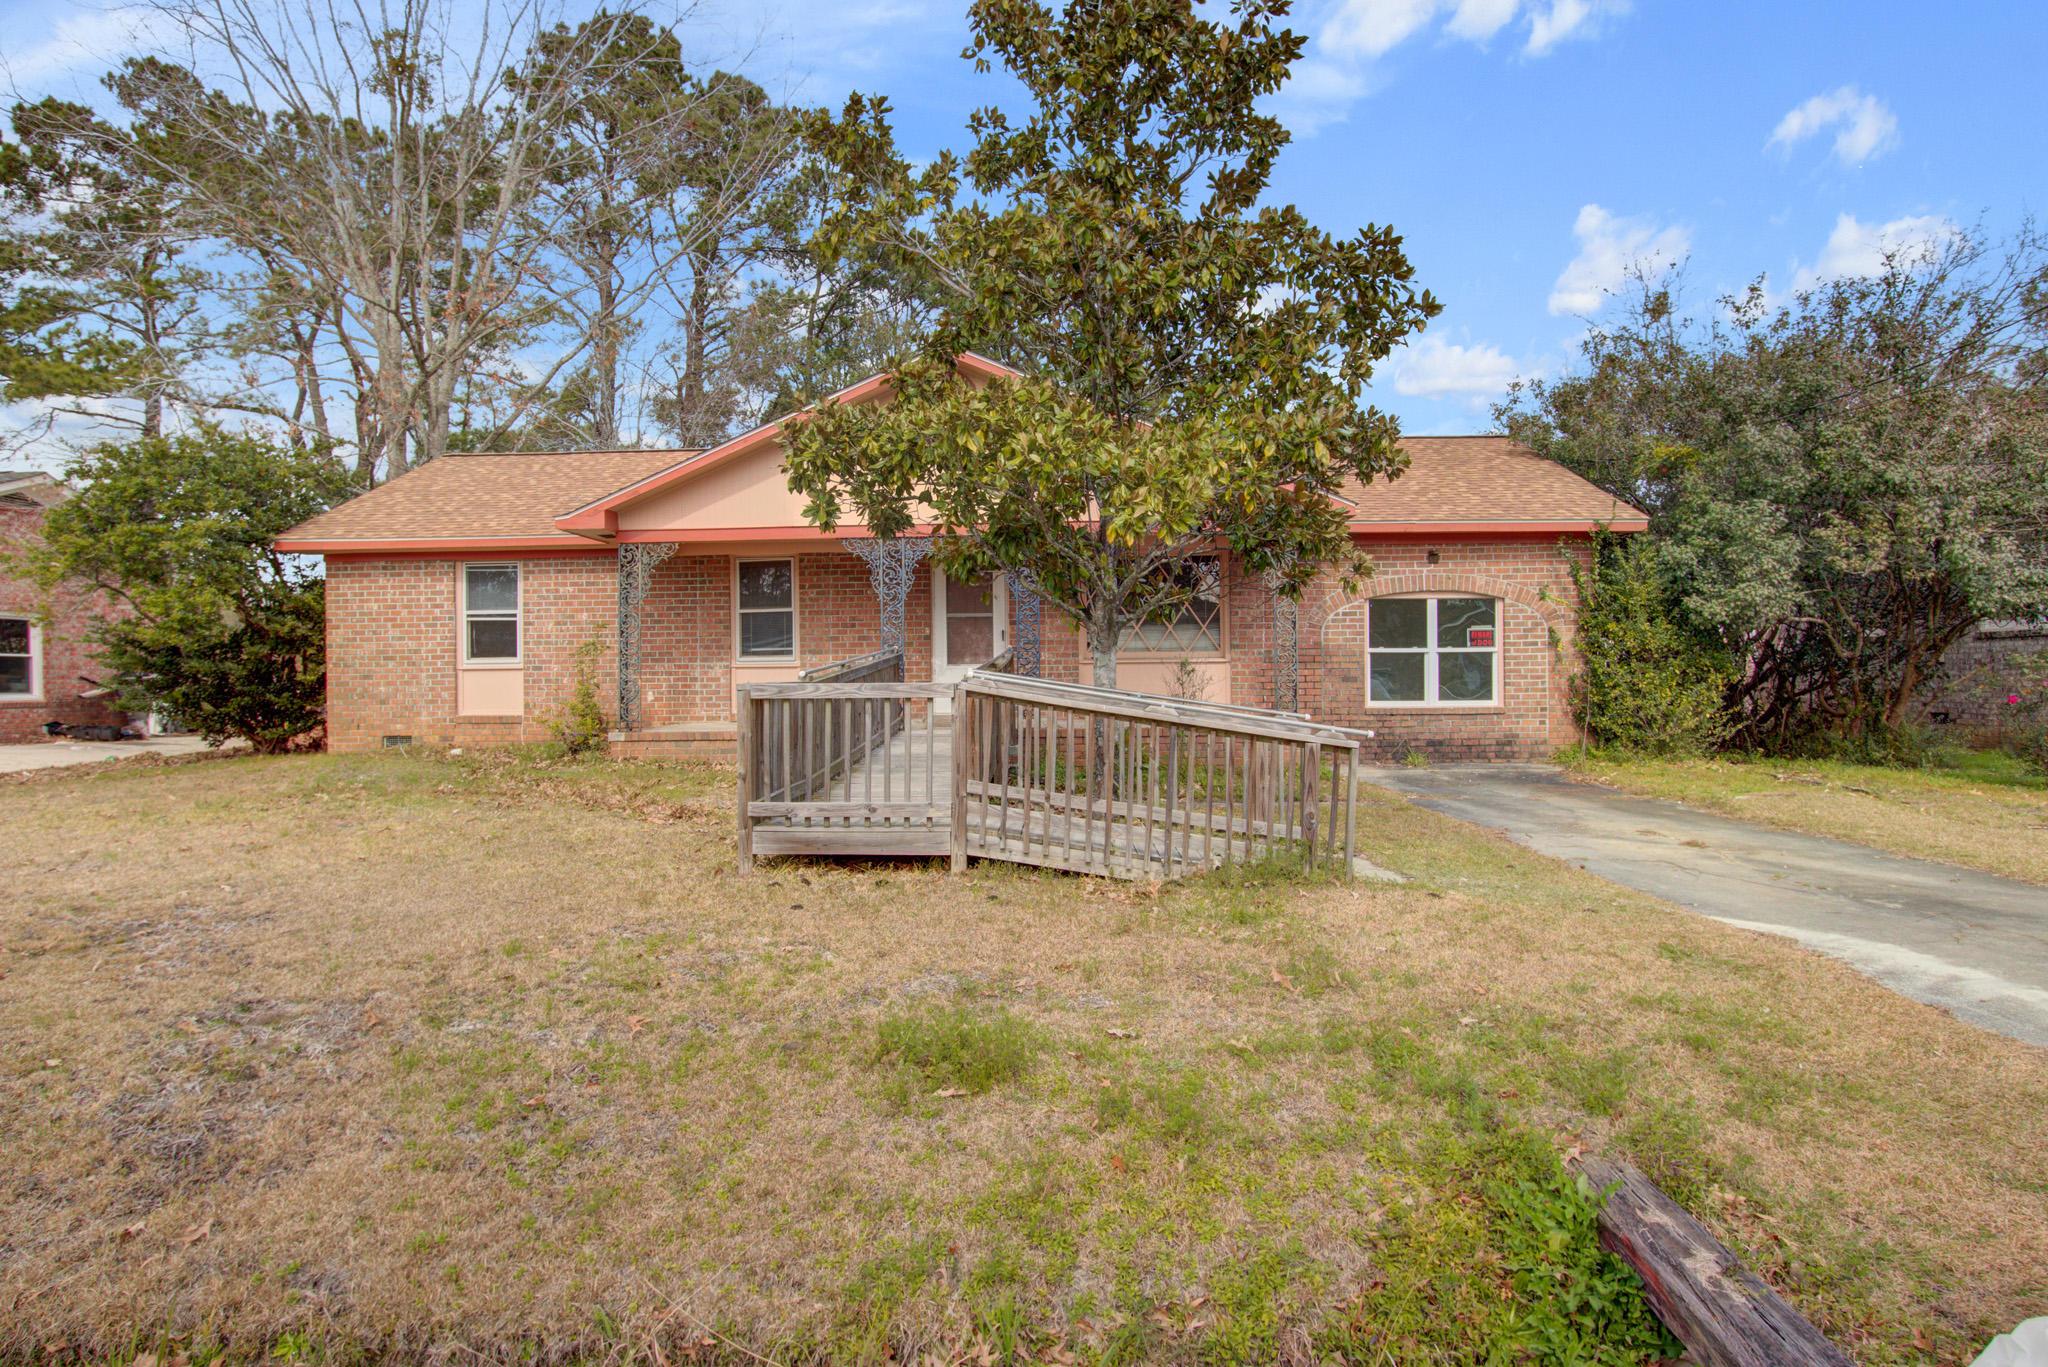 Bushy Park Terrace Homes For Sale - 125 Azalea, Goose Creek, SC - 0